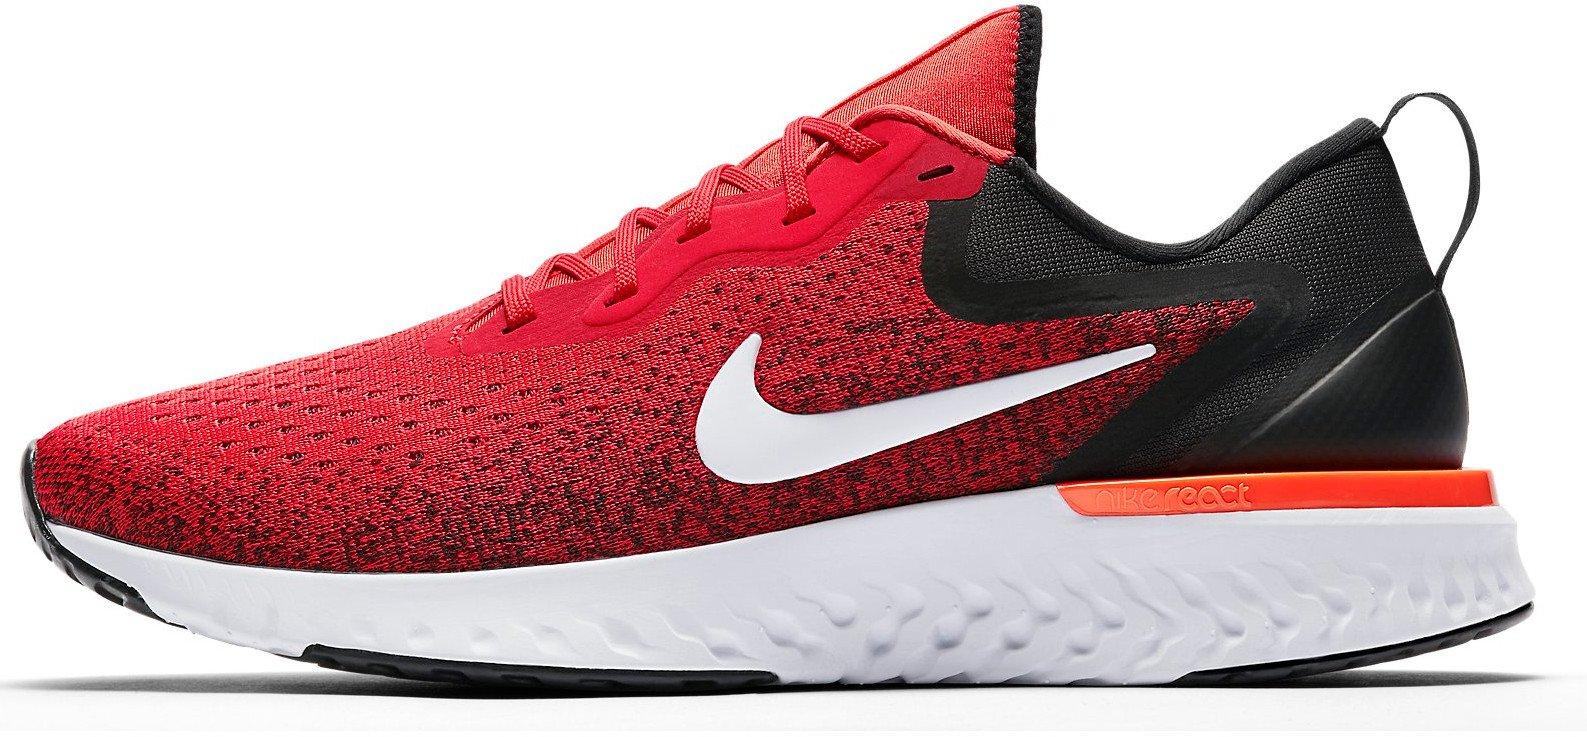 Running shoes Nike ODYSSEY REACT